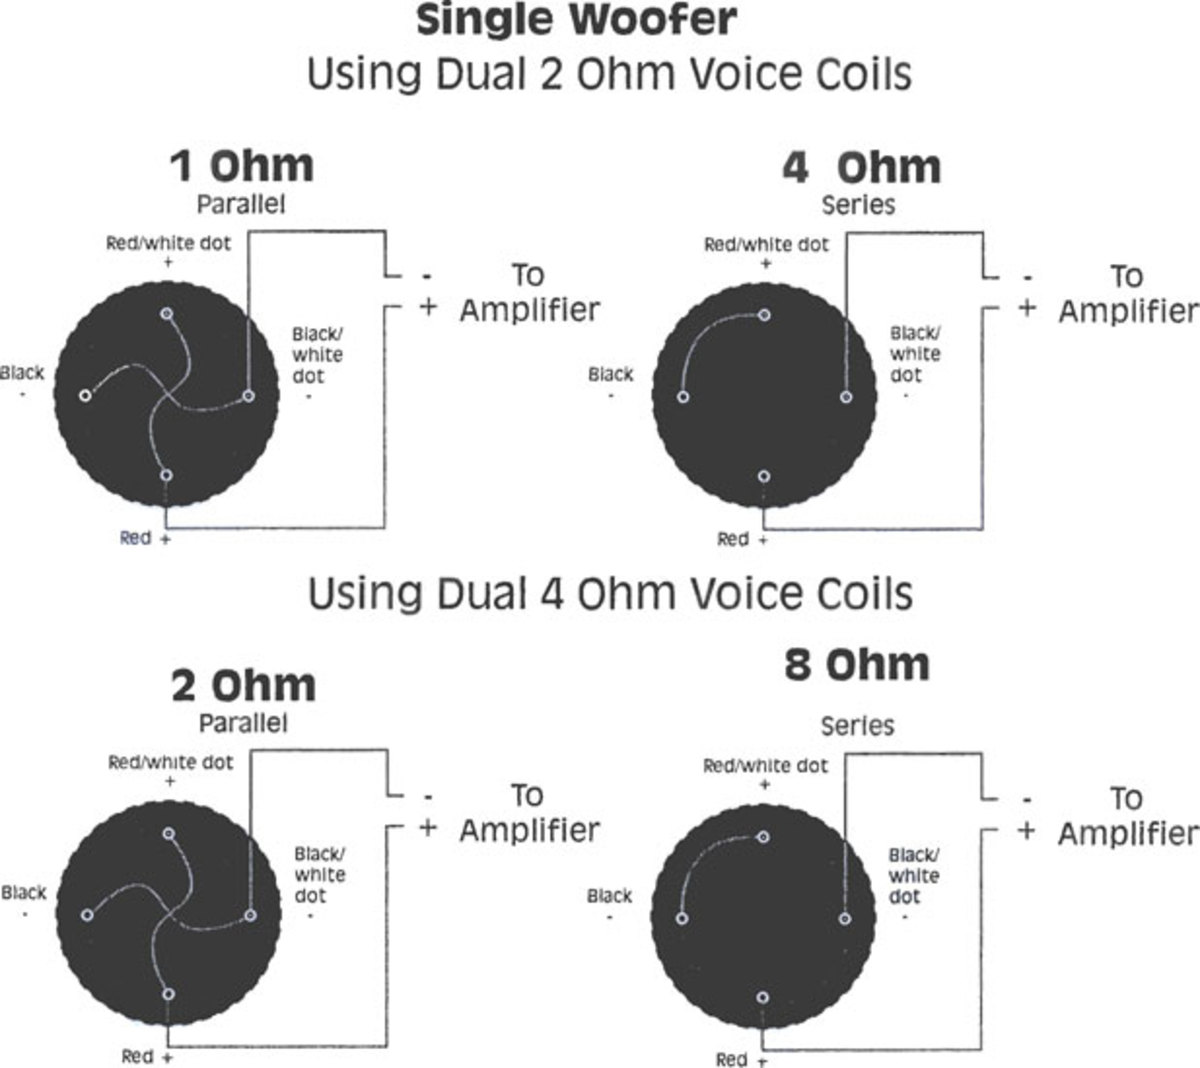 dvc wiring diagram dvc image wiring diagram kicker cvr dvc wiring diagram jodebal com on dvc wiring diagram